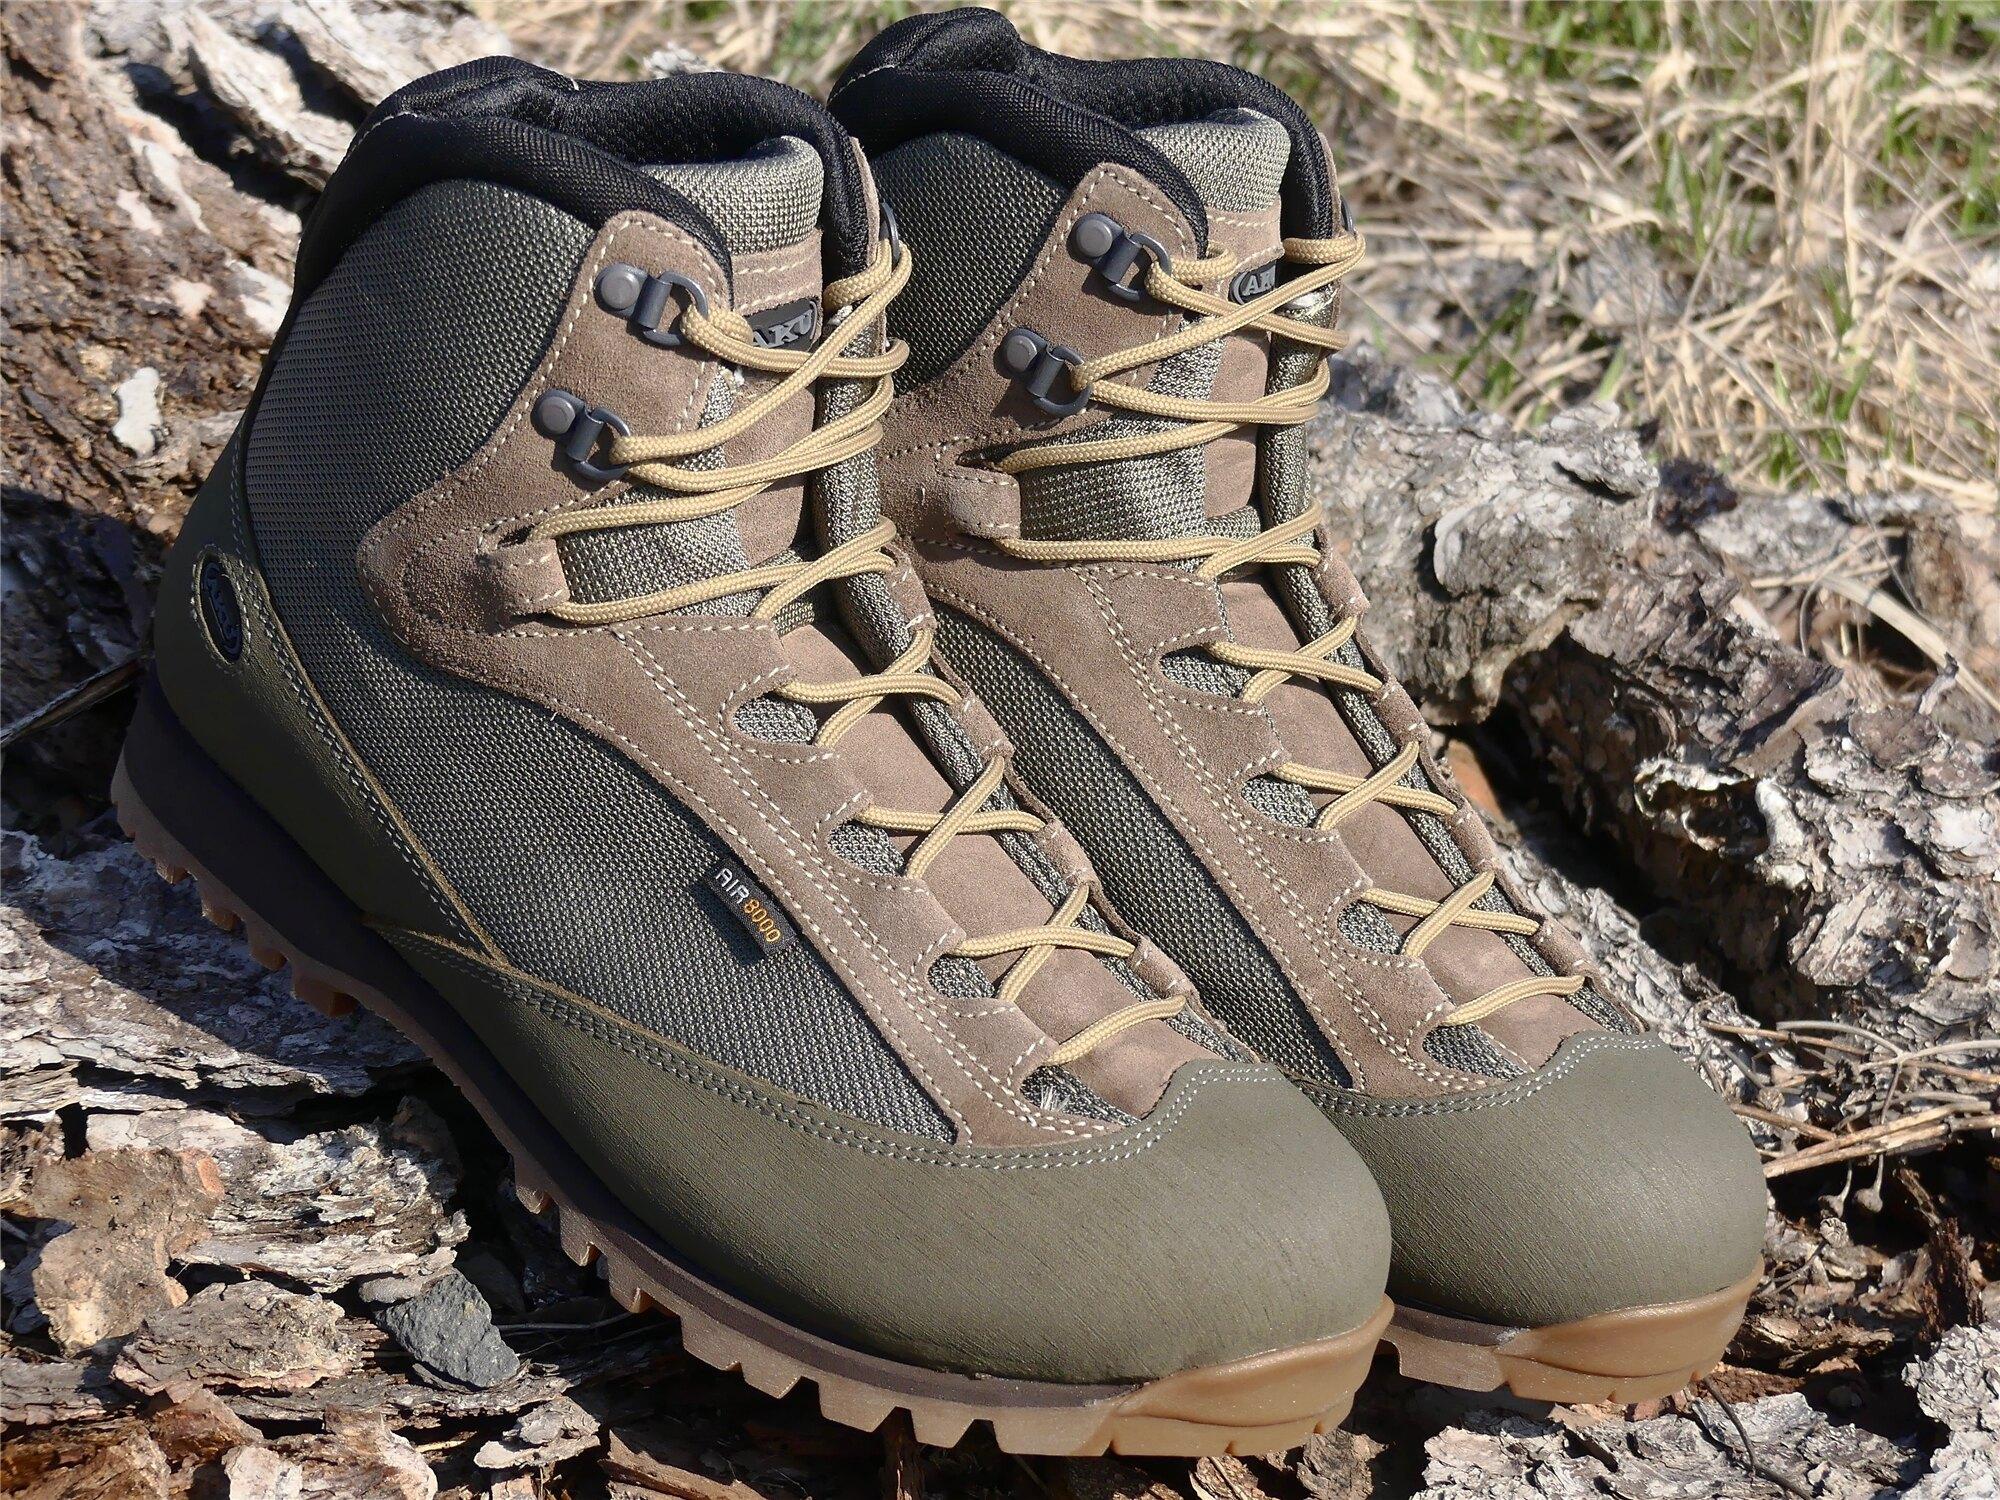 Topánky AKU Tactical® Pilgrim DS - desert beige (Veľkosť: 47 (EU))